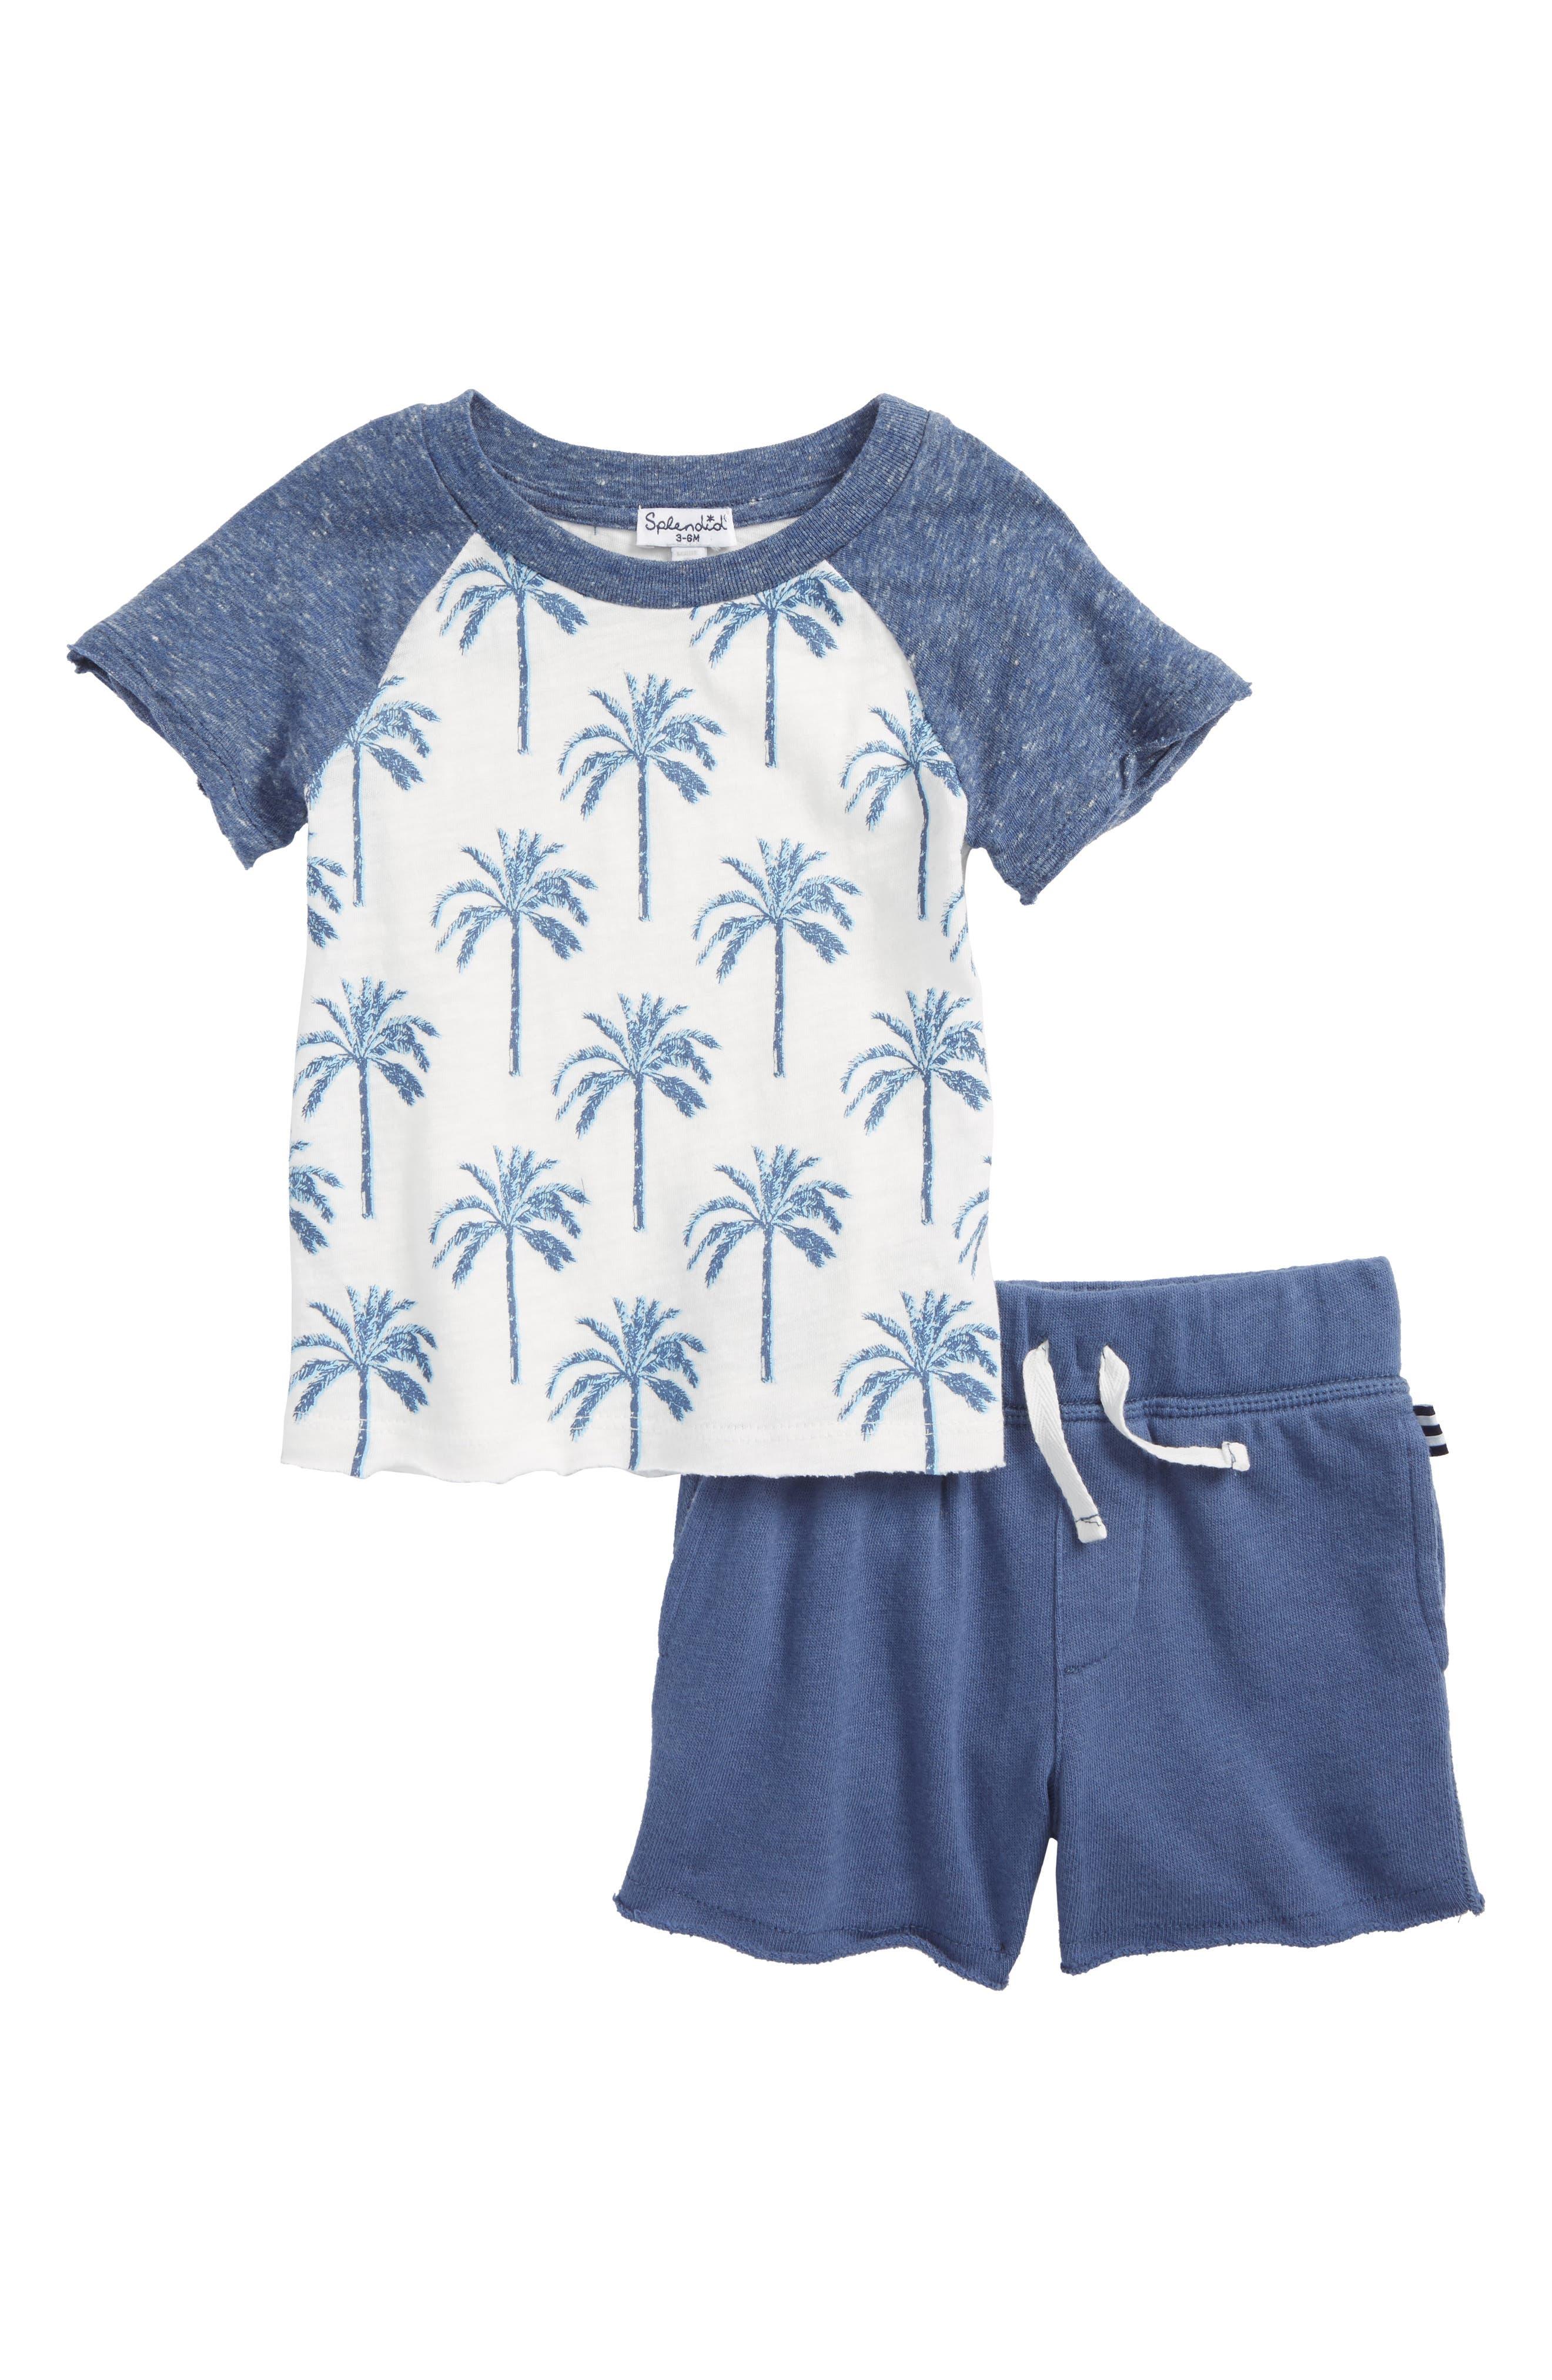 Alternate Image 1 Selected - Splendid Palm Print T-Shirt & Shorts Set (Baby)